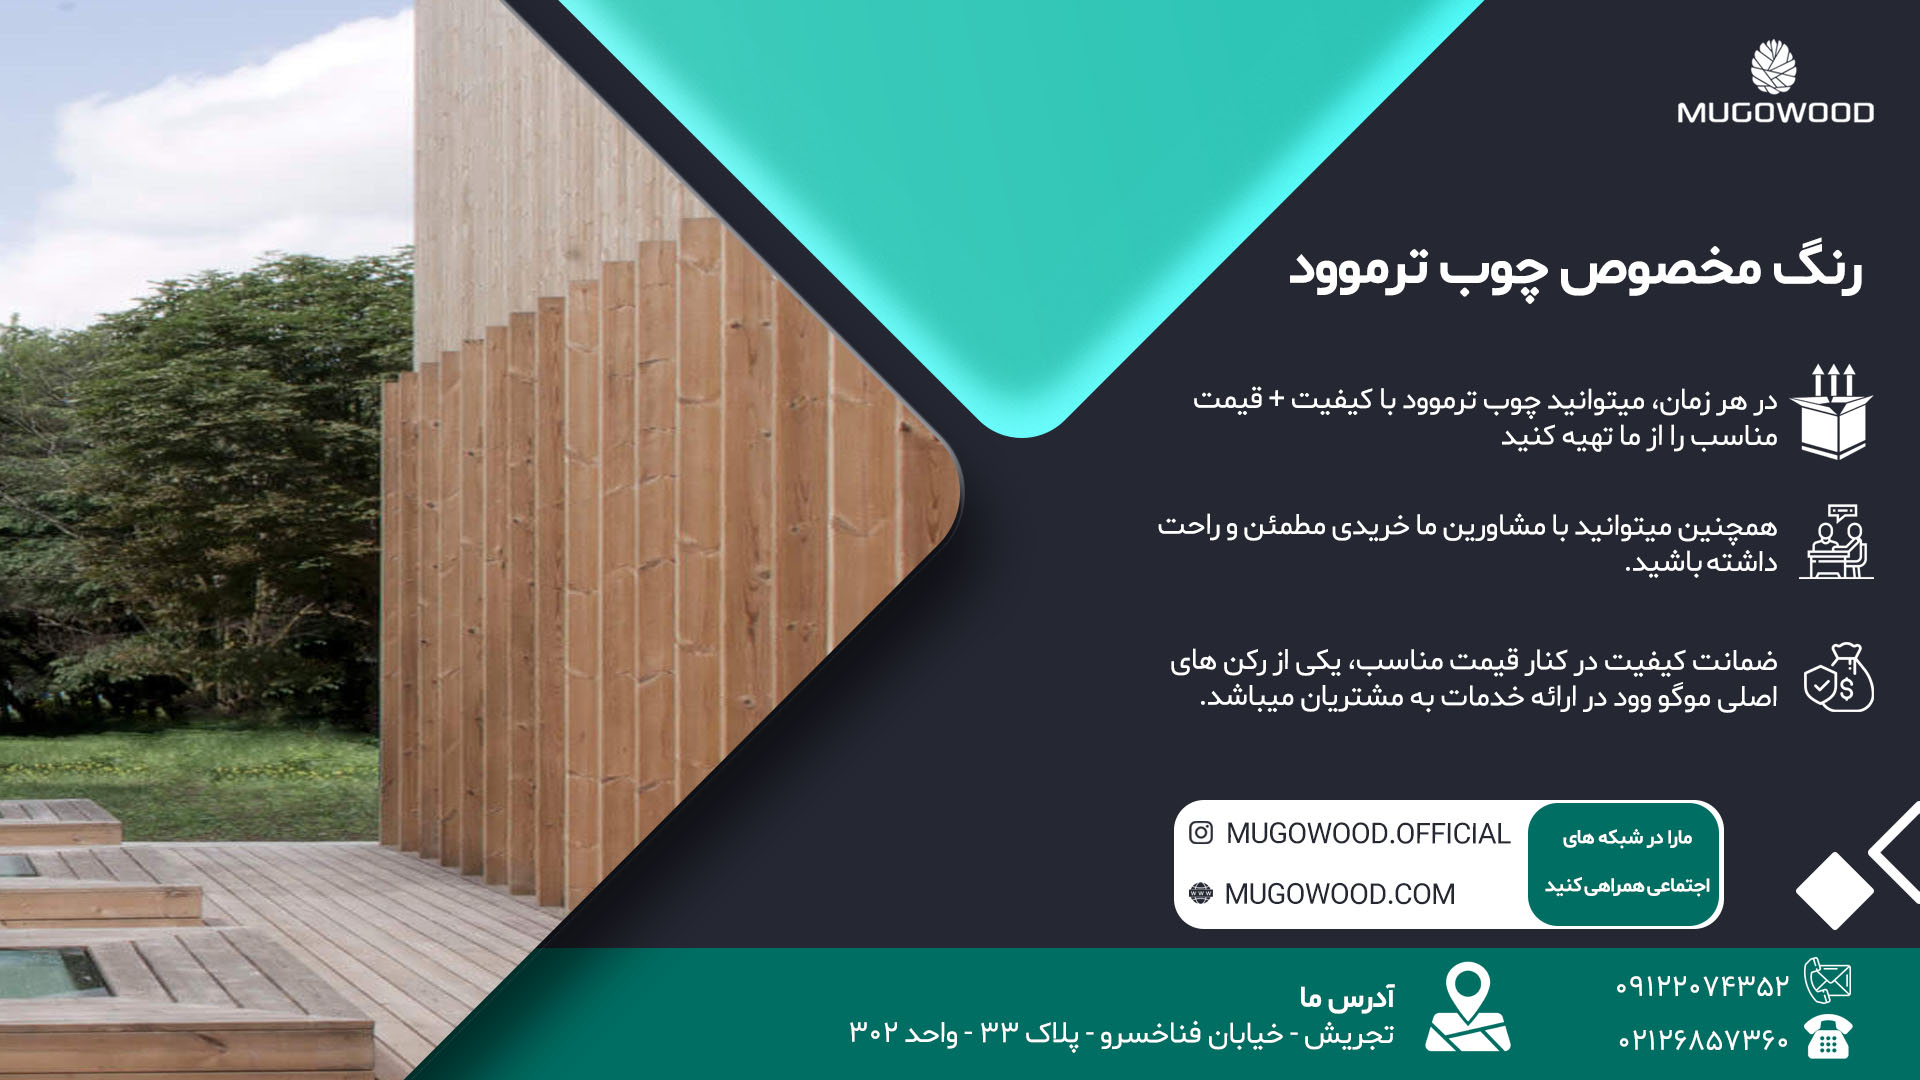 رنگ مخصوص چوب ترموود - ترموود - رنگ چوب - ابعاد ترموود - خرید رنگ چوب ترموود - ترموود - ترمووود - چوب ترموود - چوب ترمو - ترموود ایرانی - رنگ ترموود